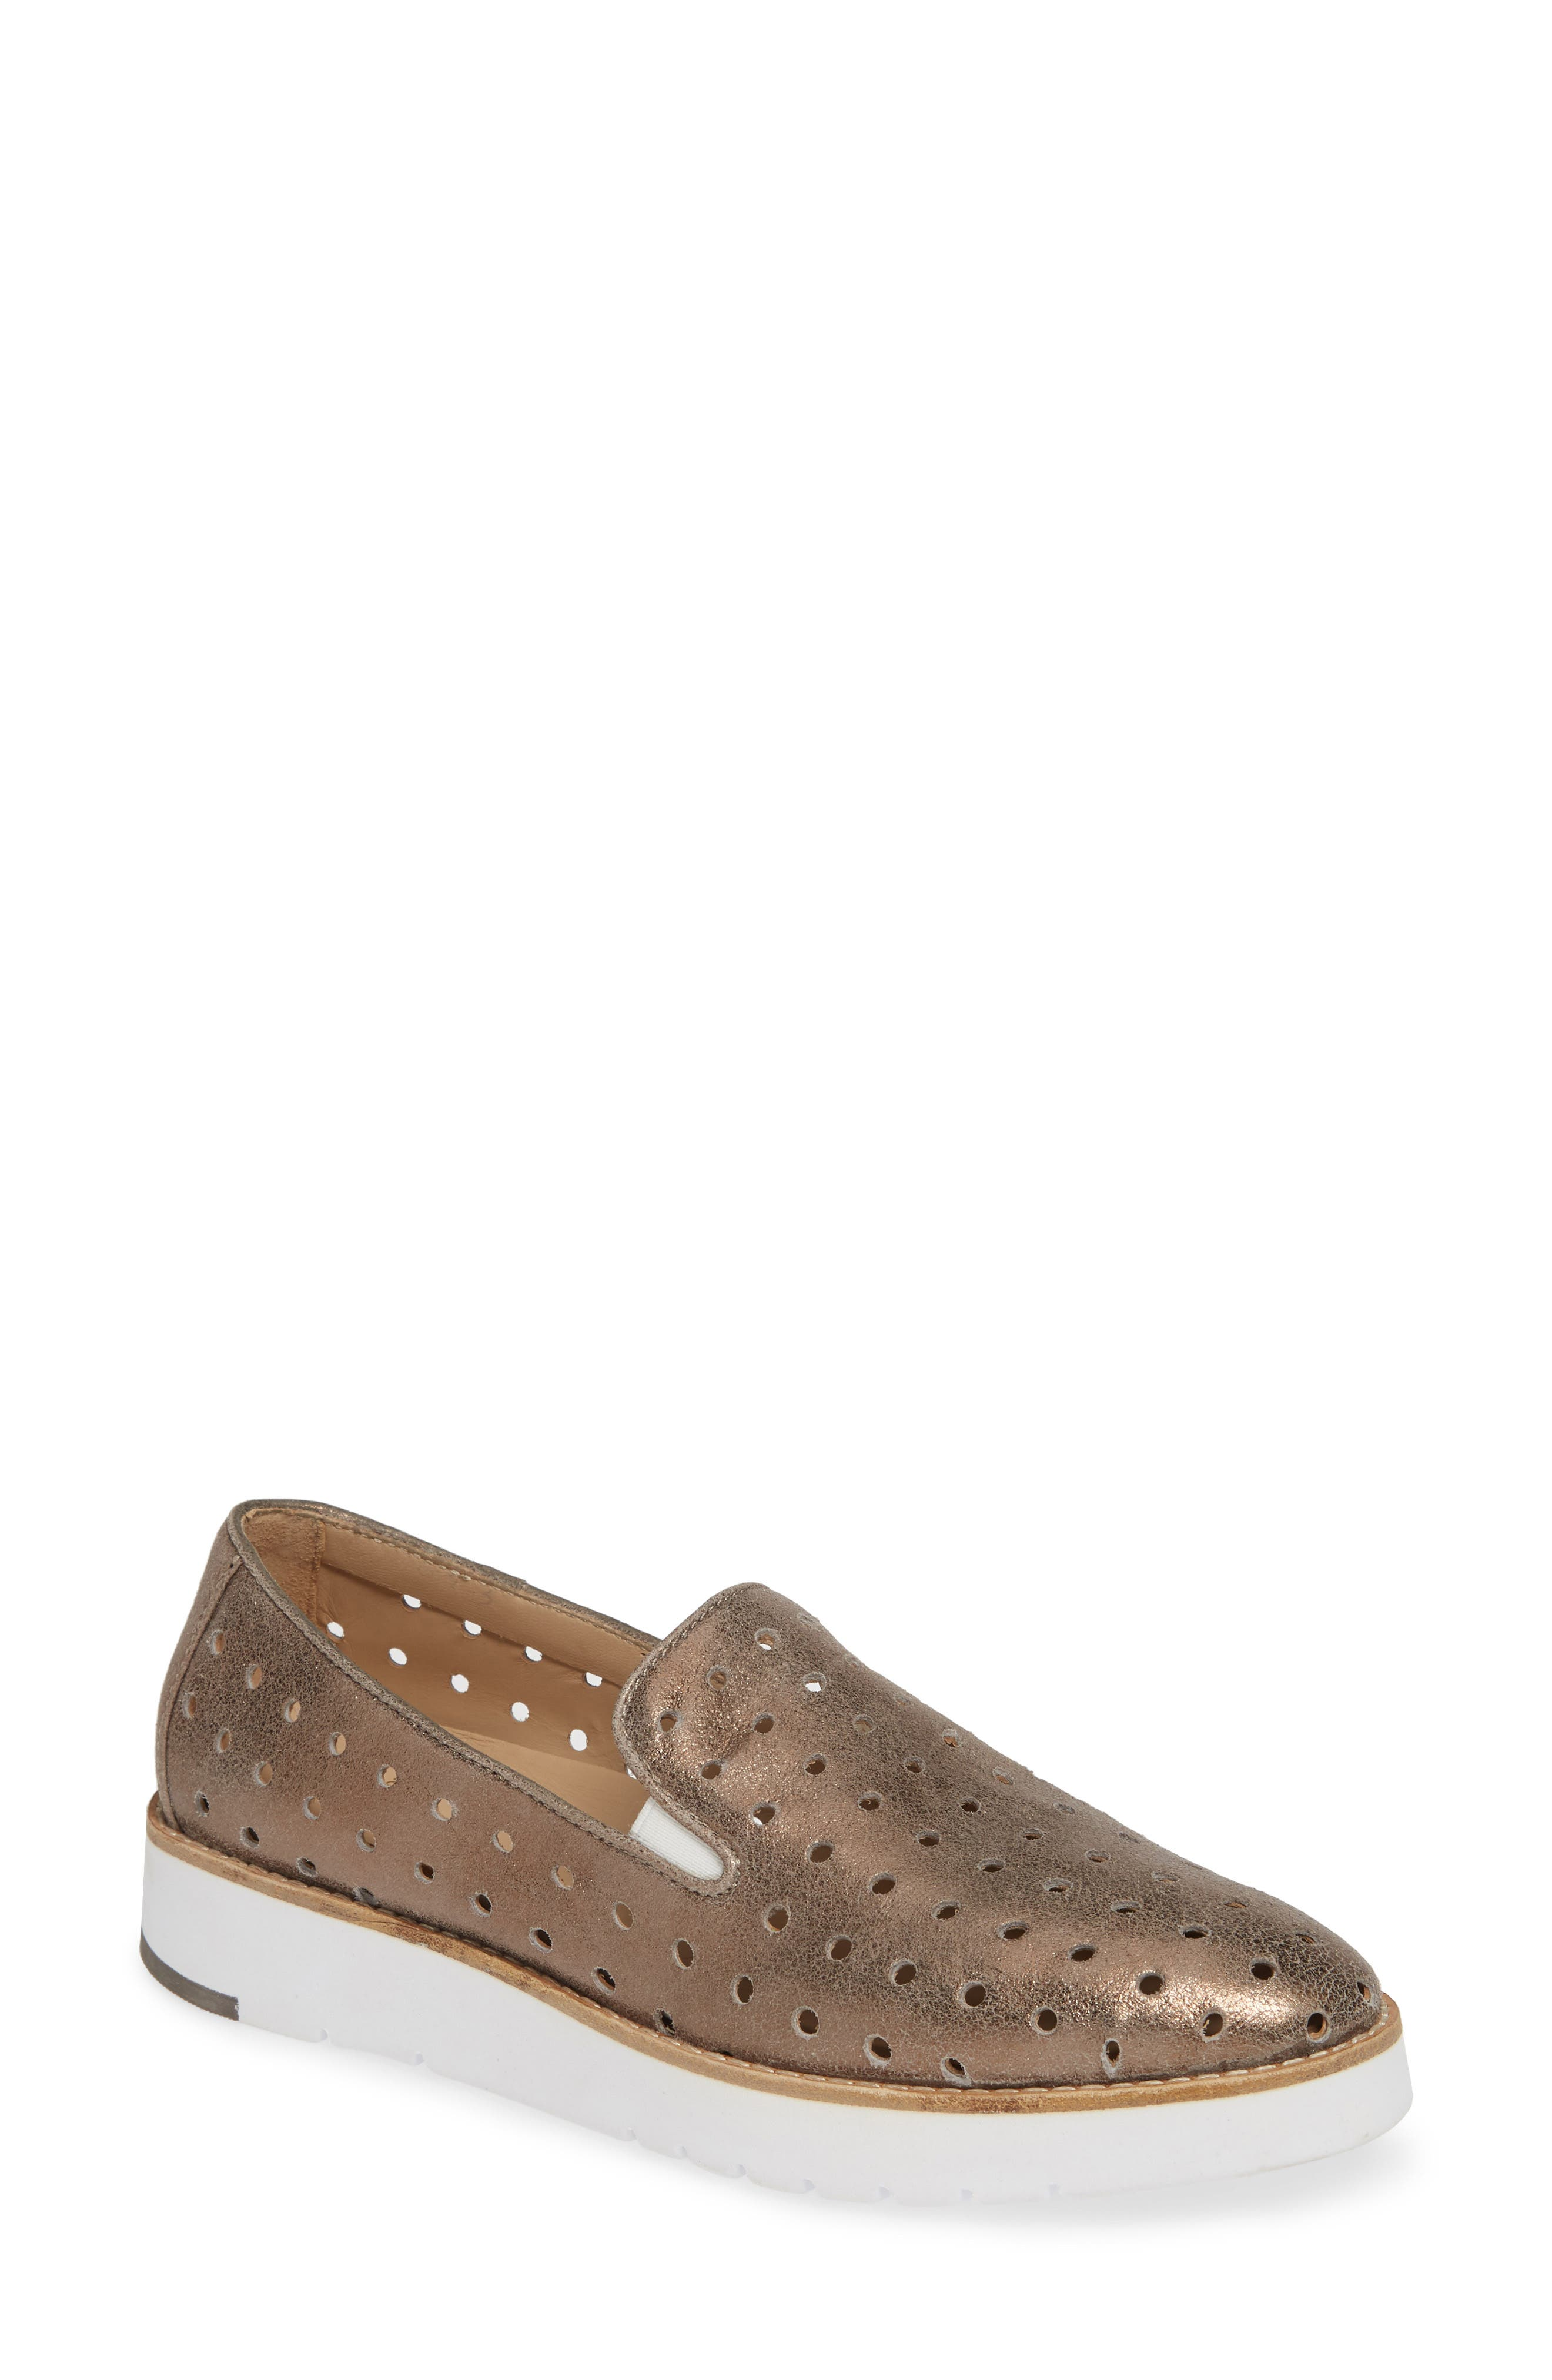 Johnston & Murphy Penelope Perforated Slip-On Sneaker, Grey